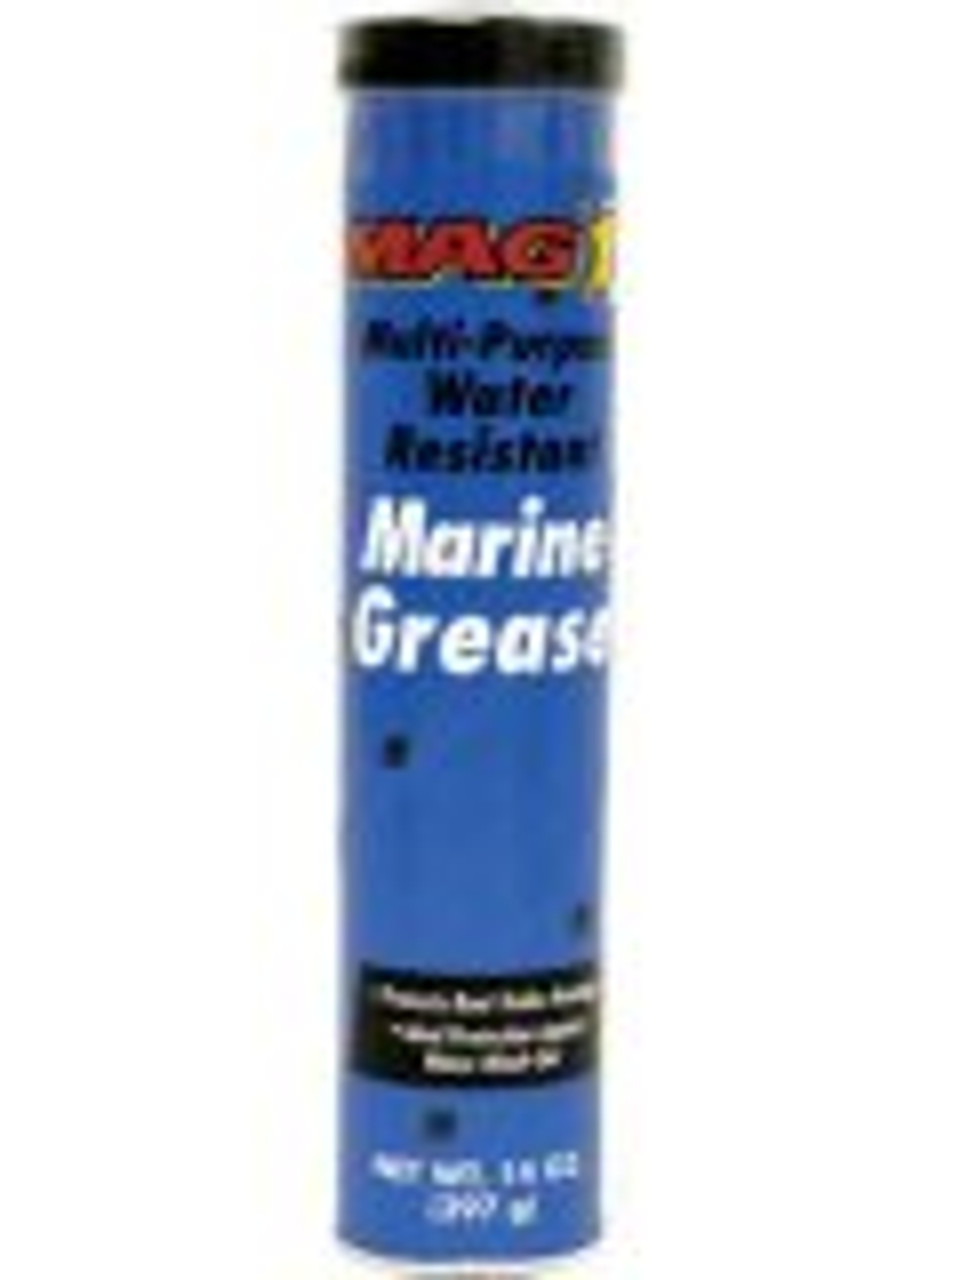 MG7690 --- MAG1® MULTI-PURPOSE MARINE GREASE